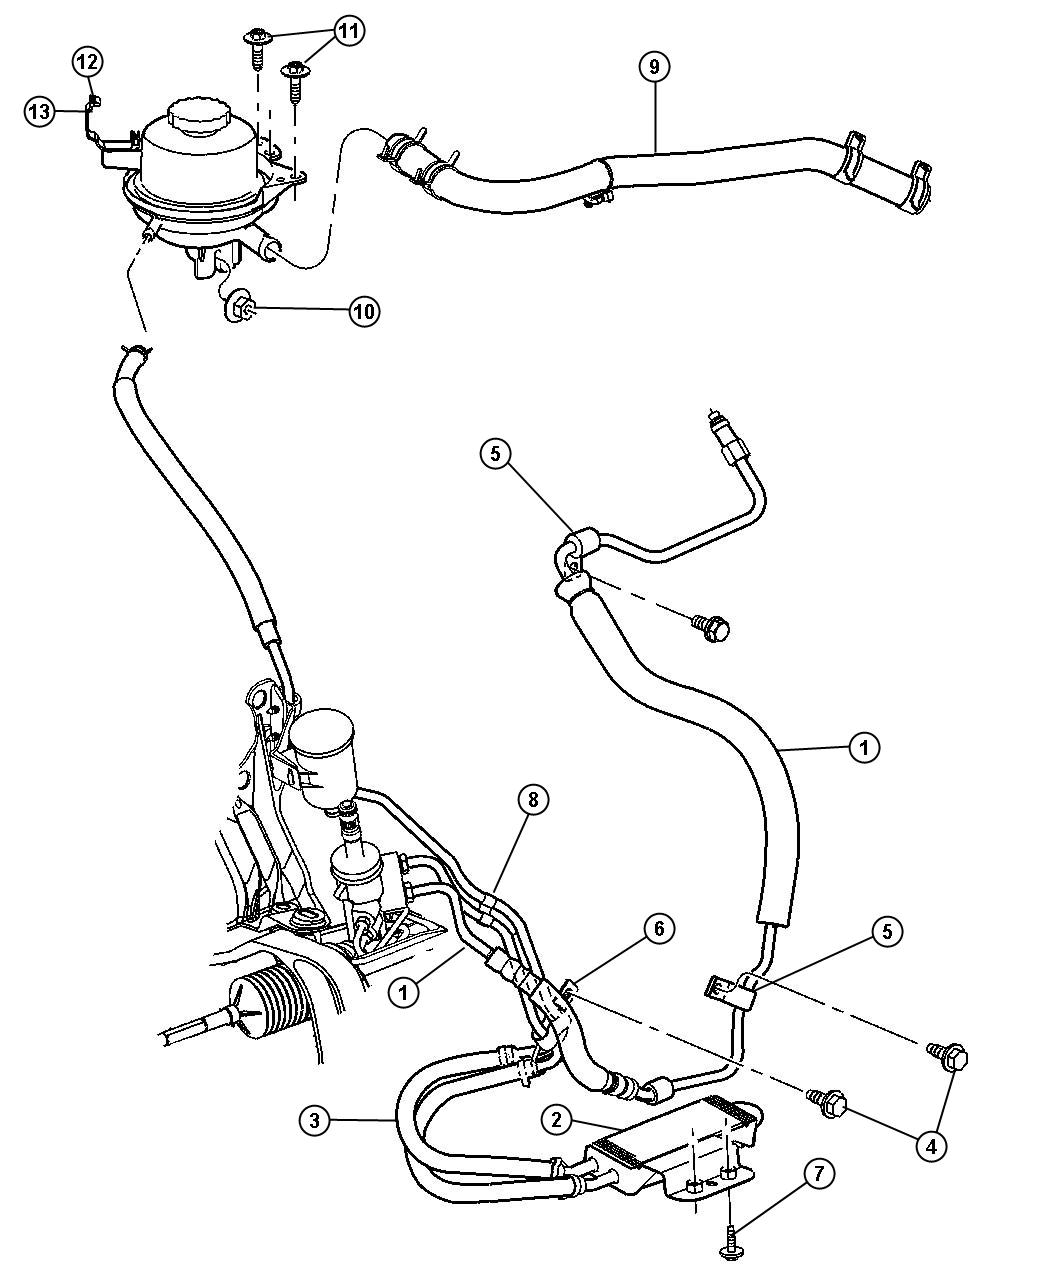 Dodge Ram Cooler Power Steering Rack Pinion